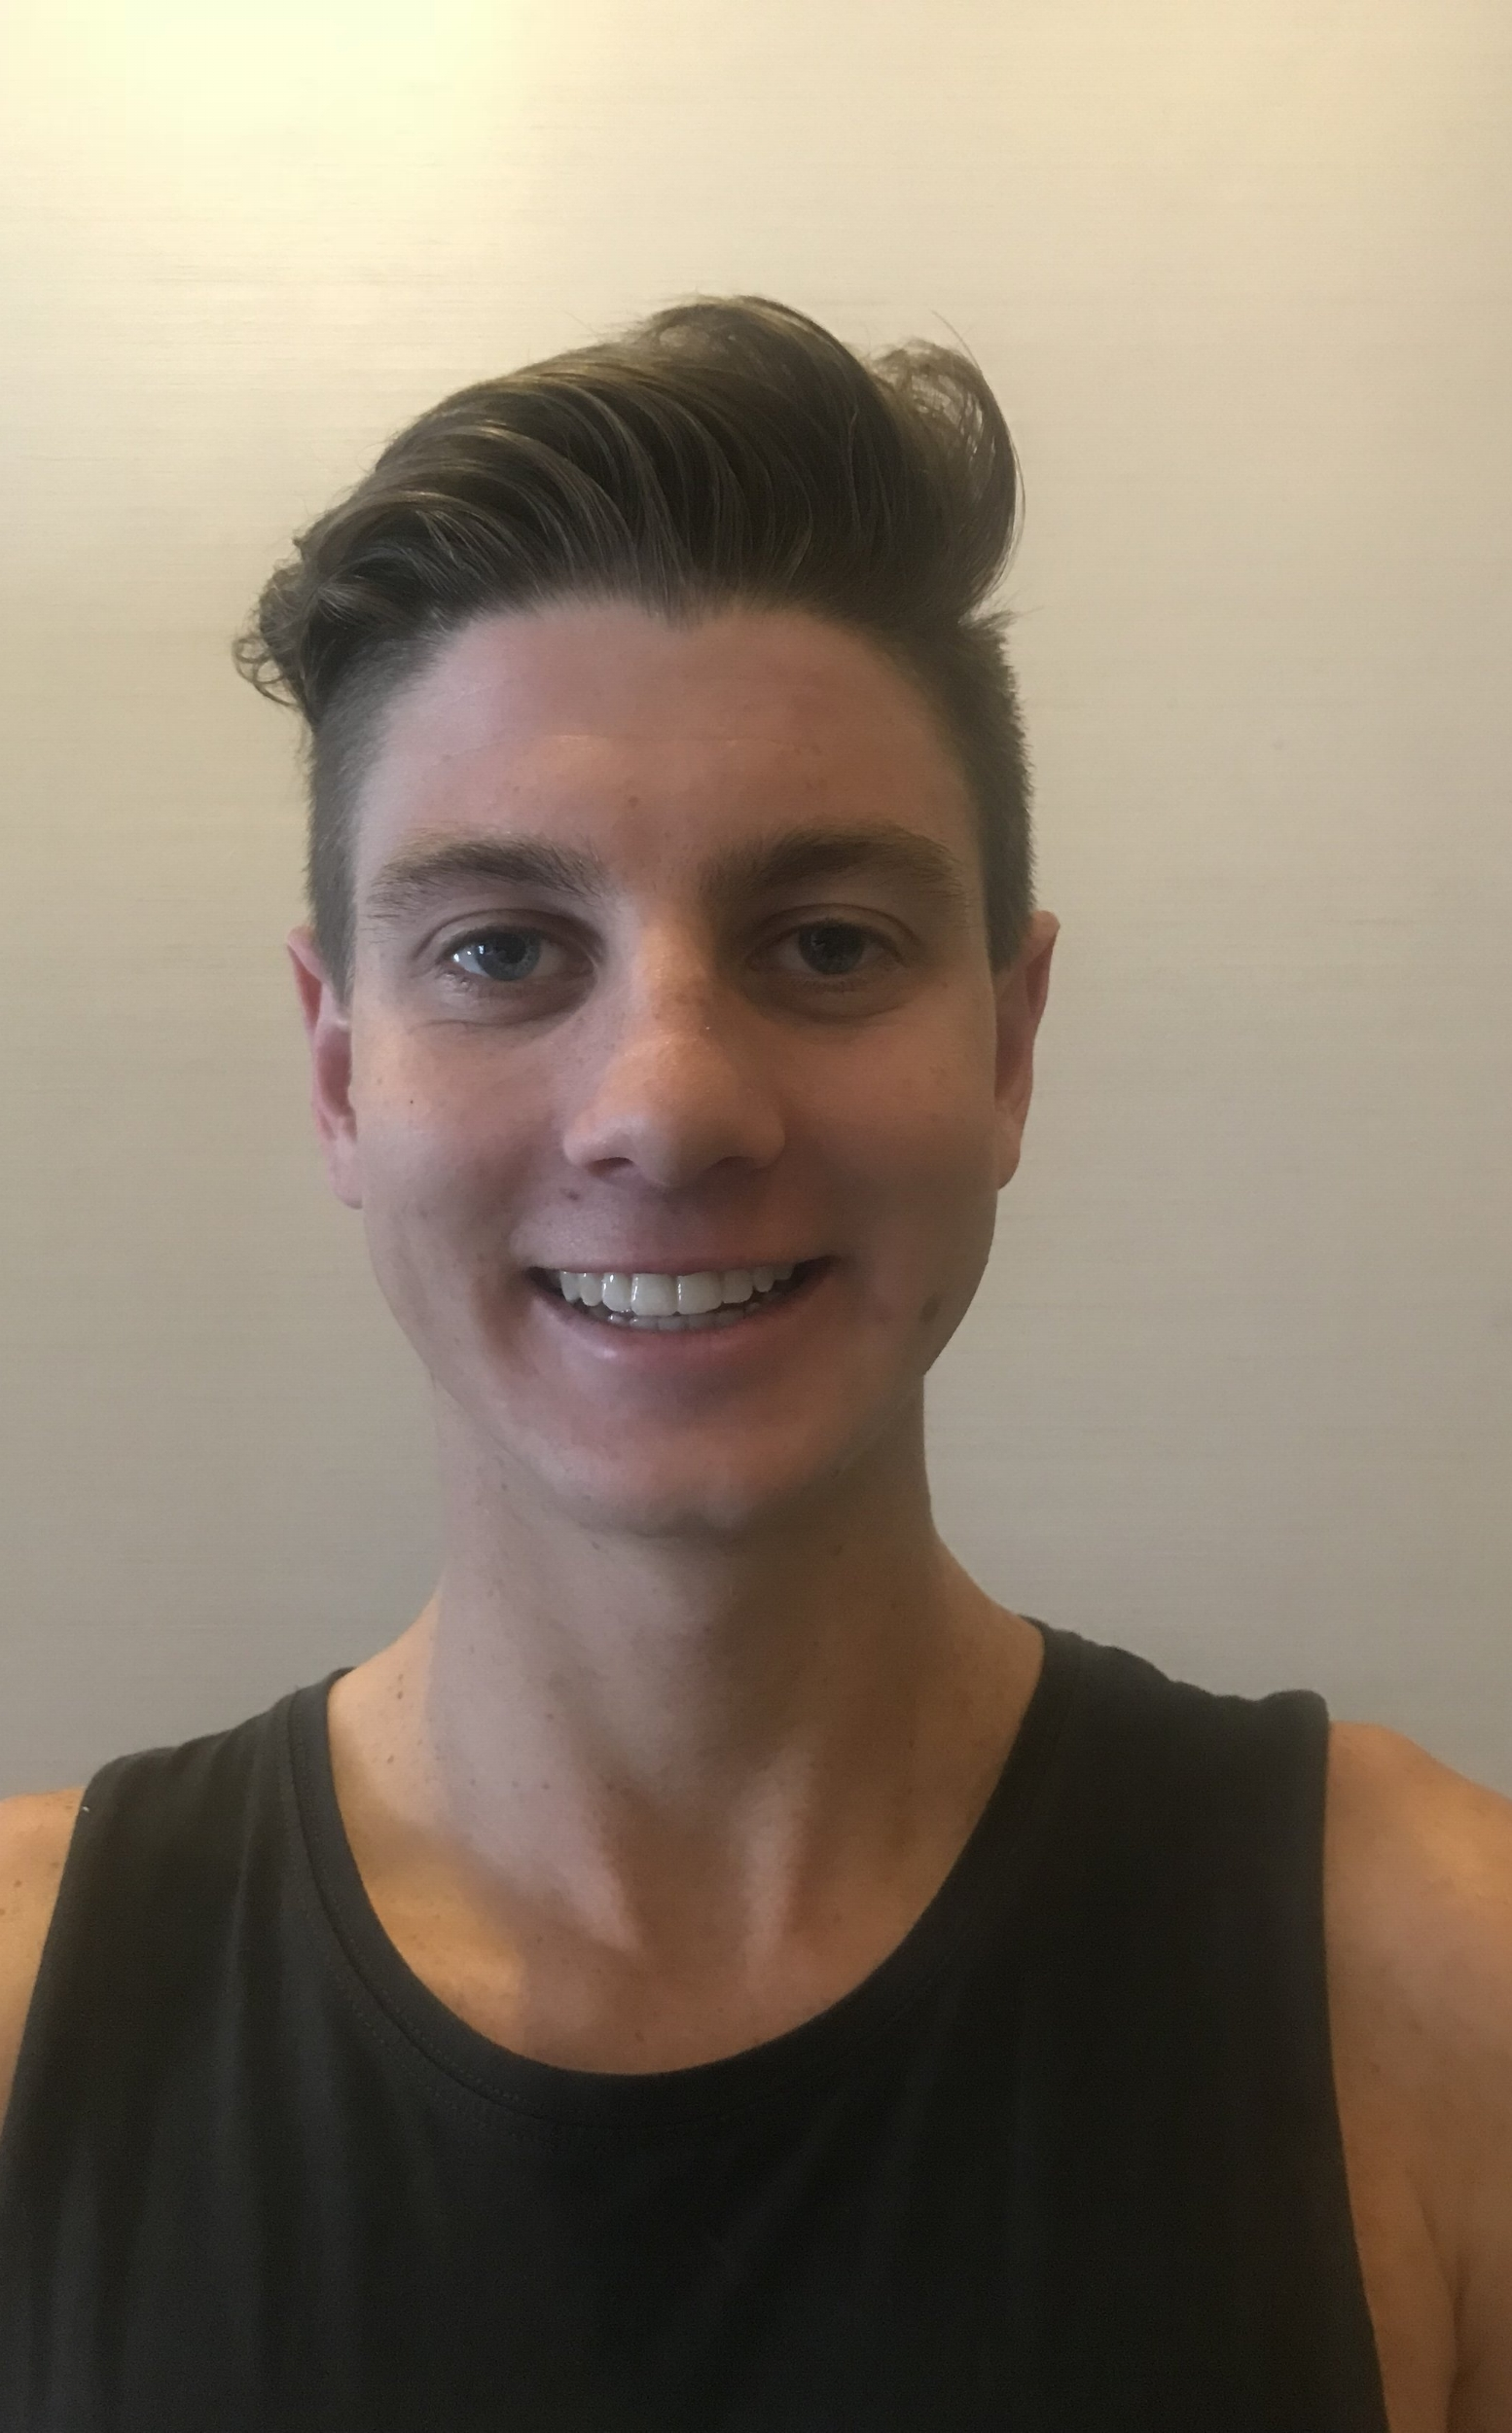 Brandon Copeland